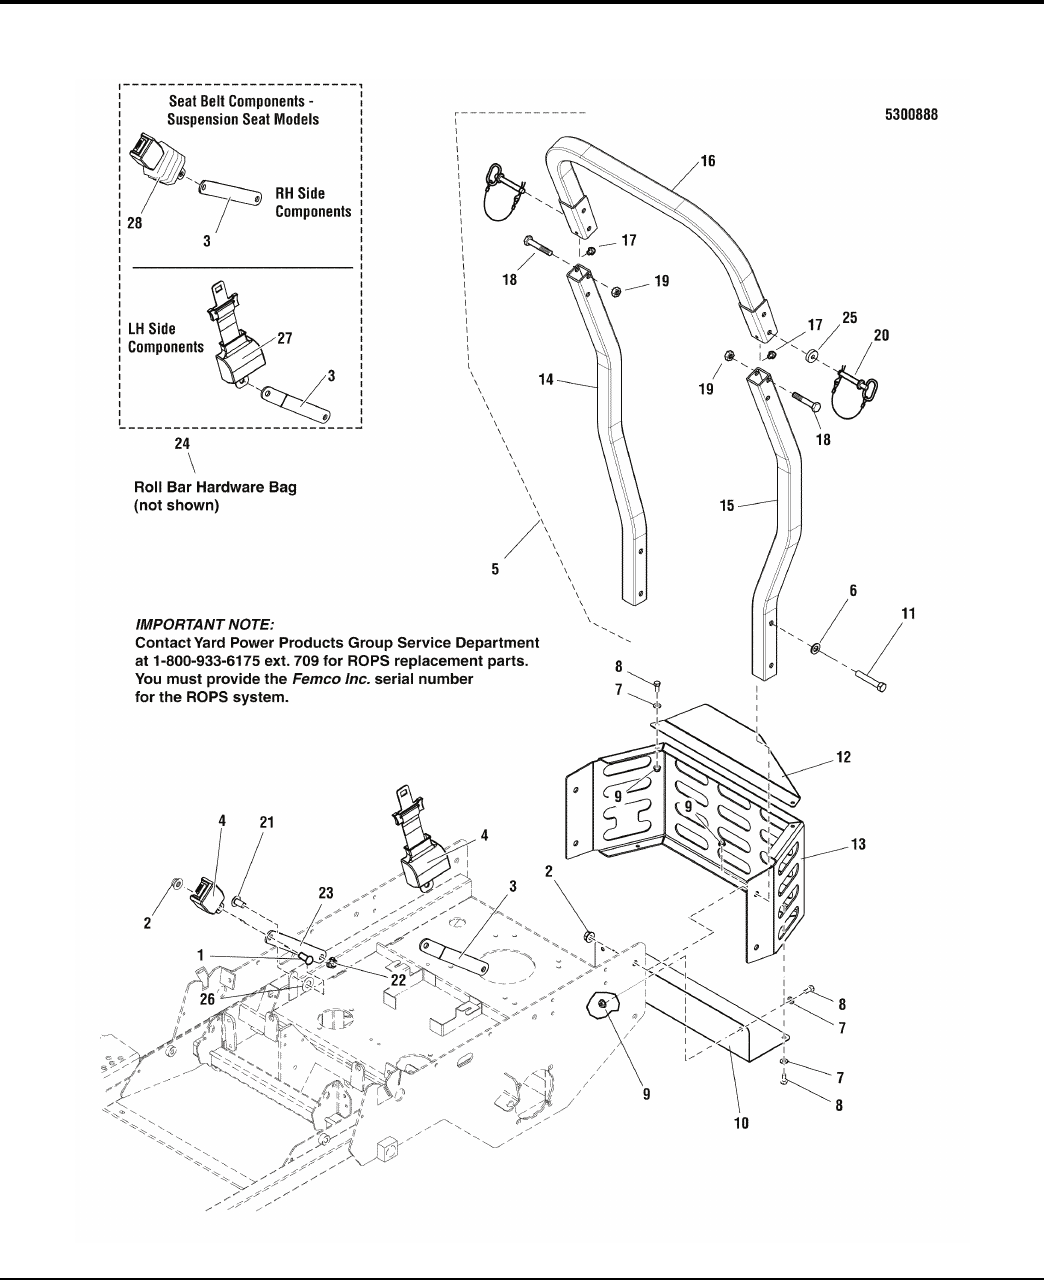 partsmanual s150x series jgipu kp 5fz xfix2 Wiring RS-422 not for